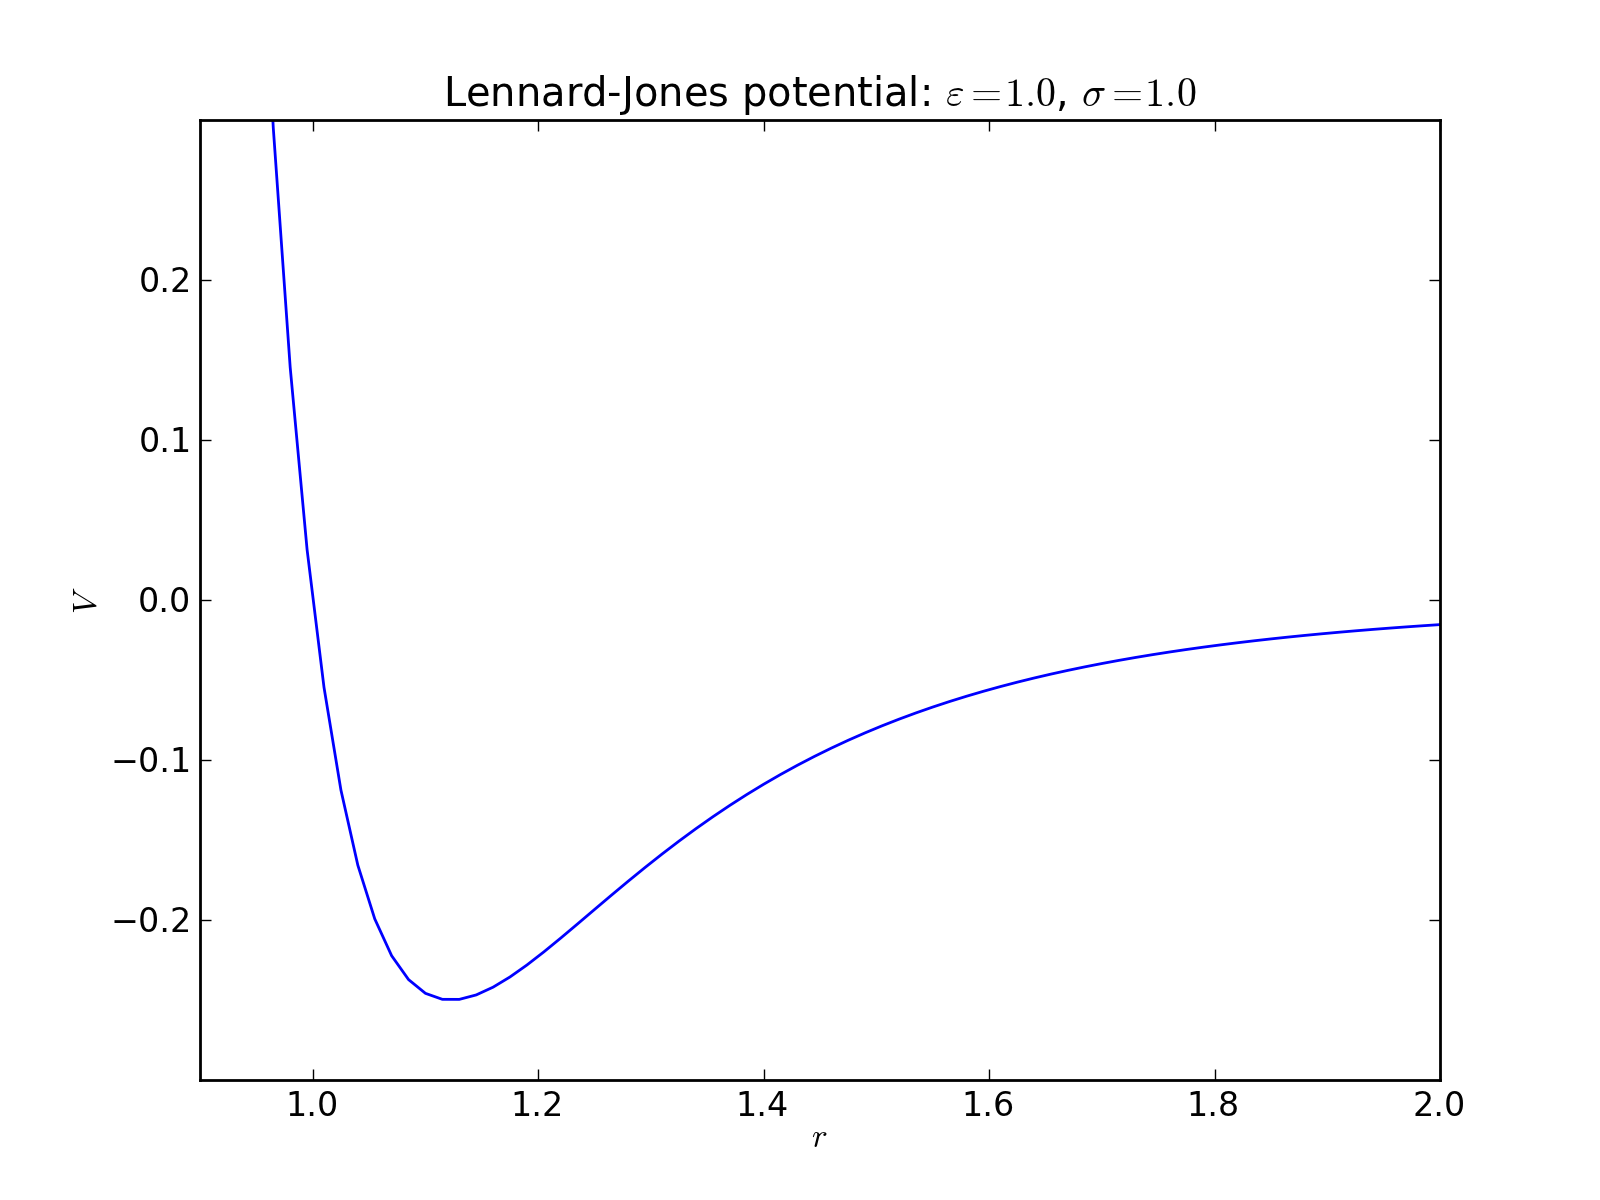 lennard-jones